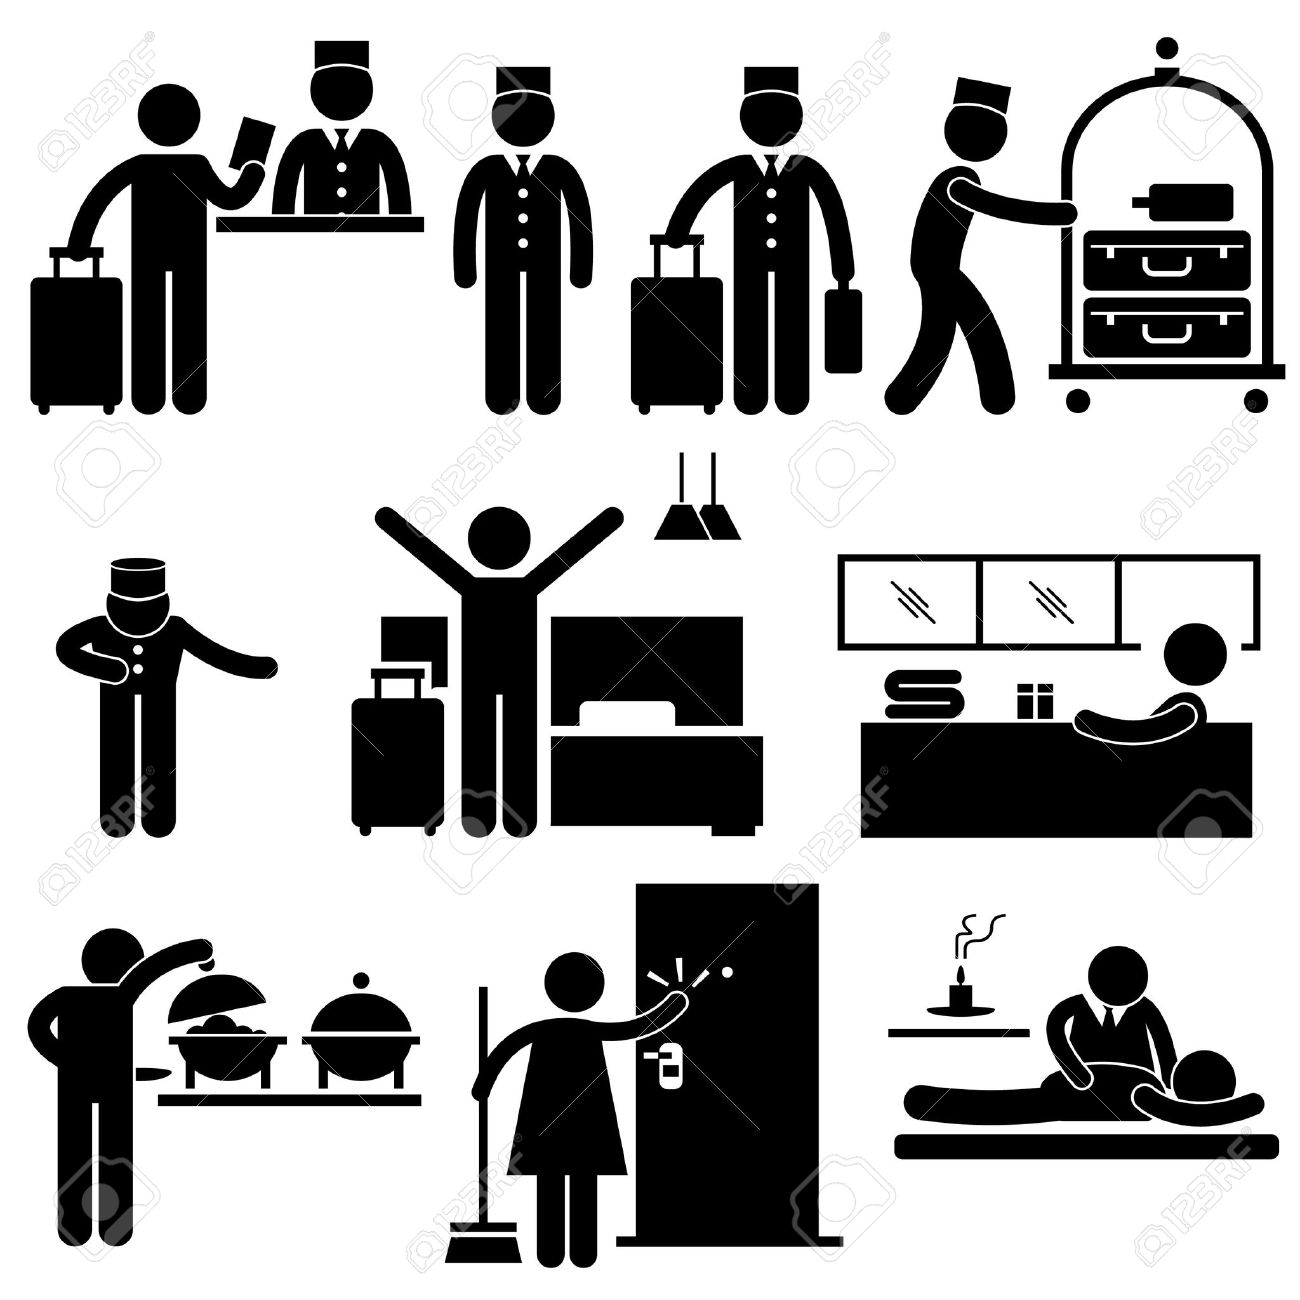 Housekeeping clipart hotel housekeeping. Station